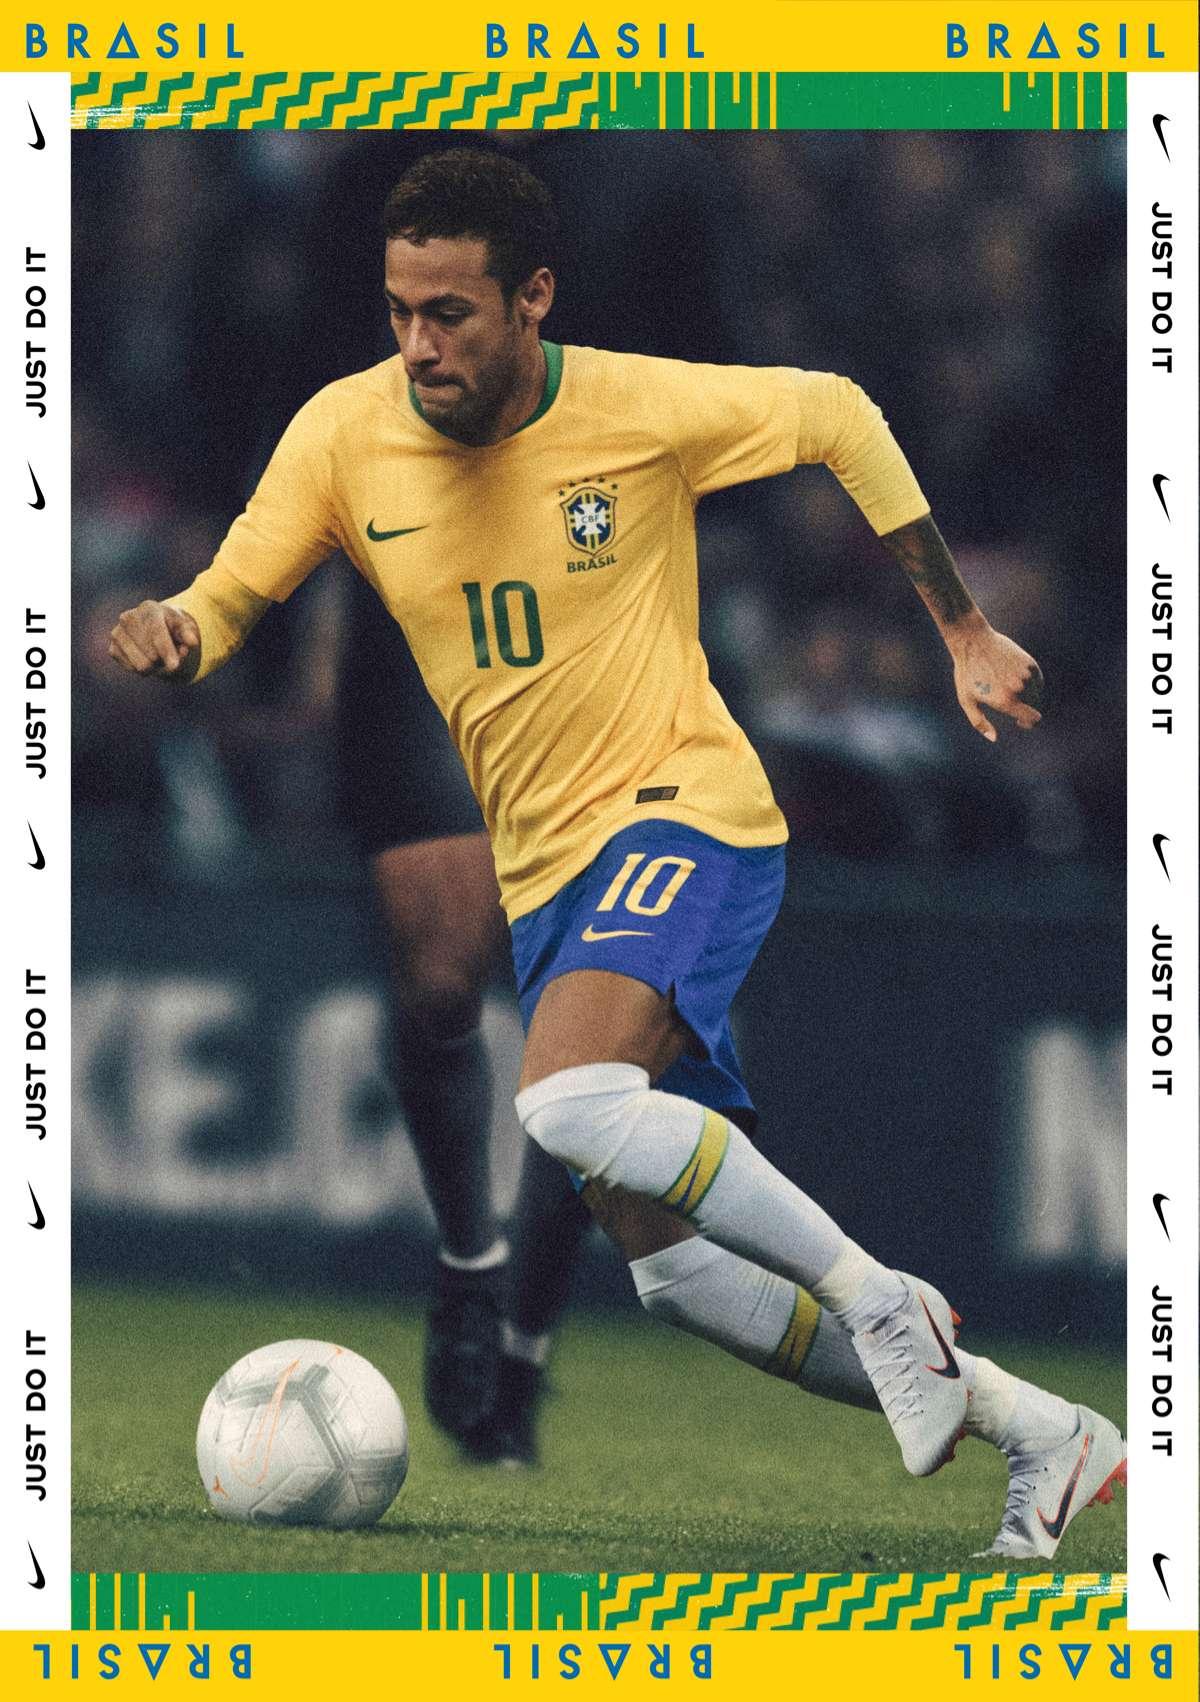 JUST DO IT | BRASIL